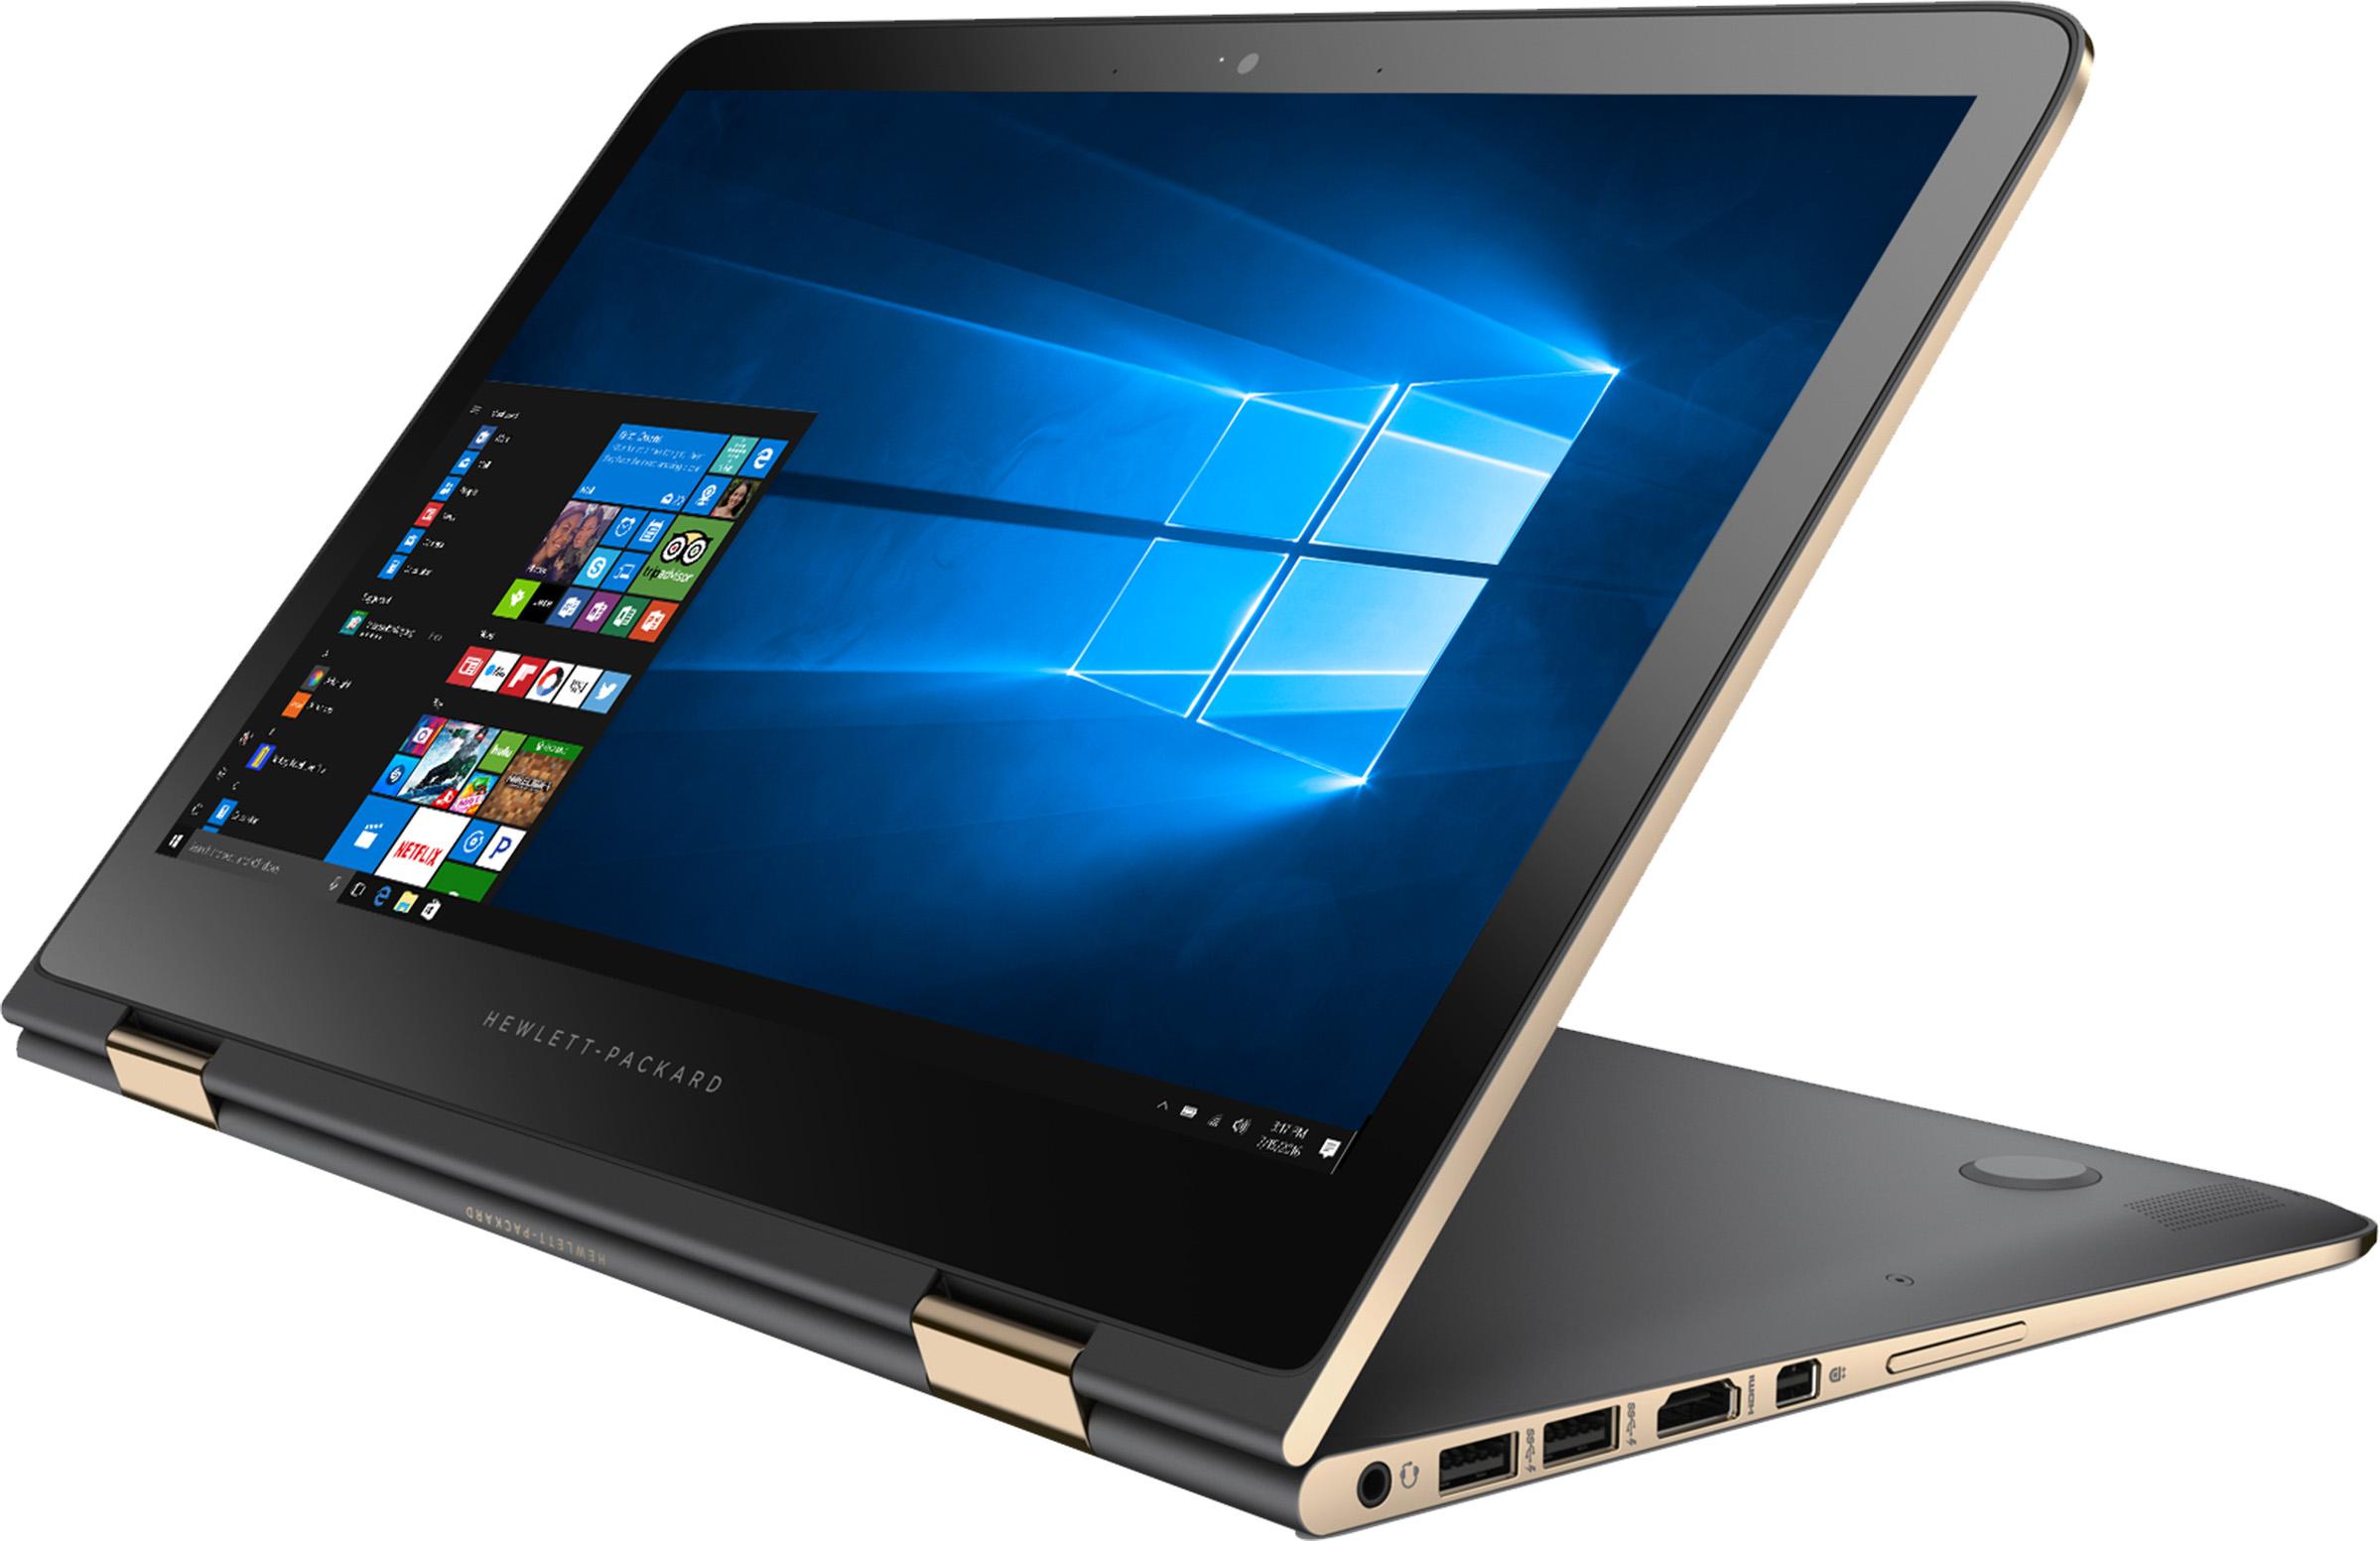 HP Spectre x360 13-4196ms Signature Edition 2 in 1 PC